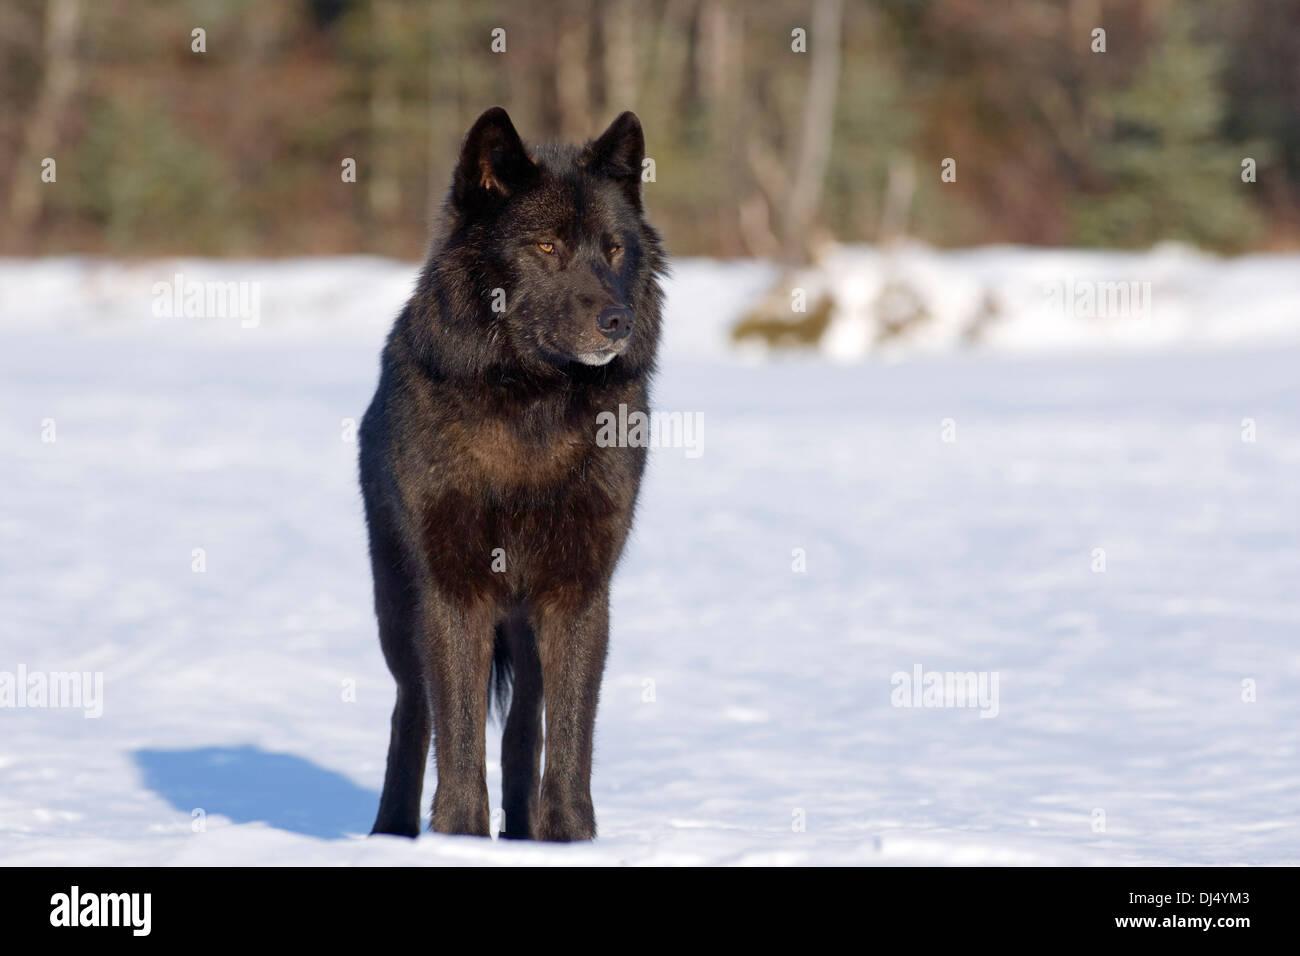 black wolf profile stockfotos black wolf profile bilder alamy. Black Bedroom Furniture Sets. Home Design Ideas